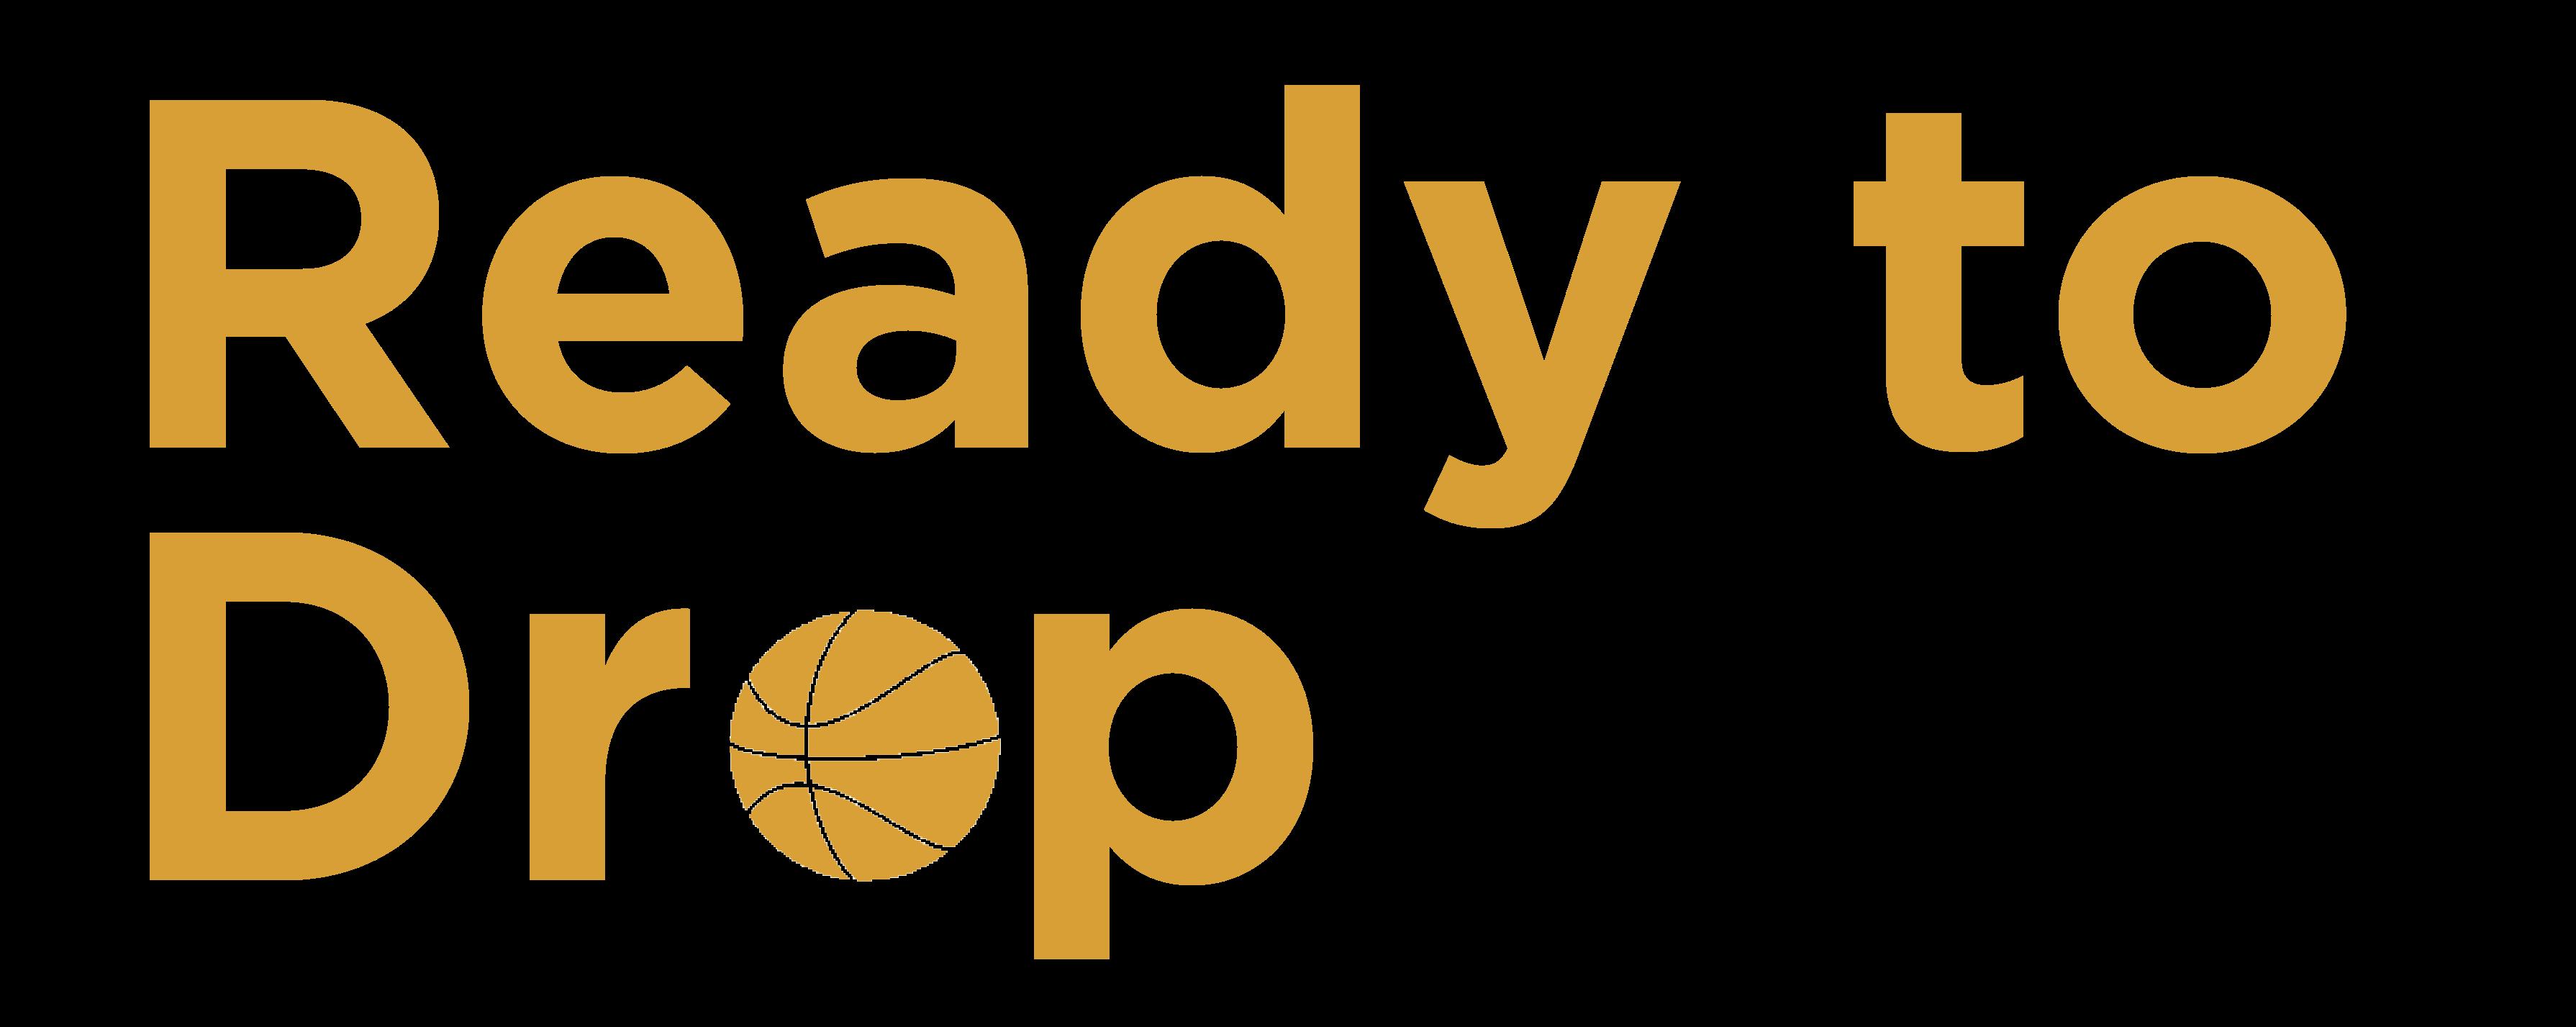 Ready To Drop logo